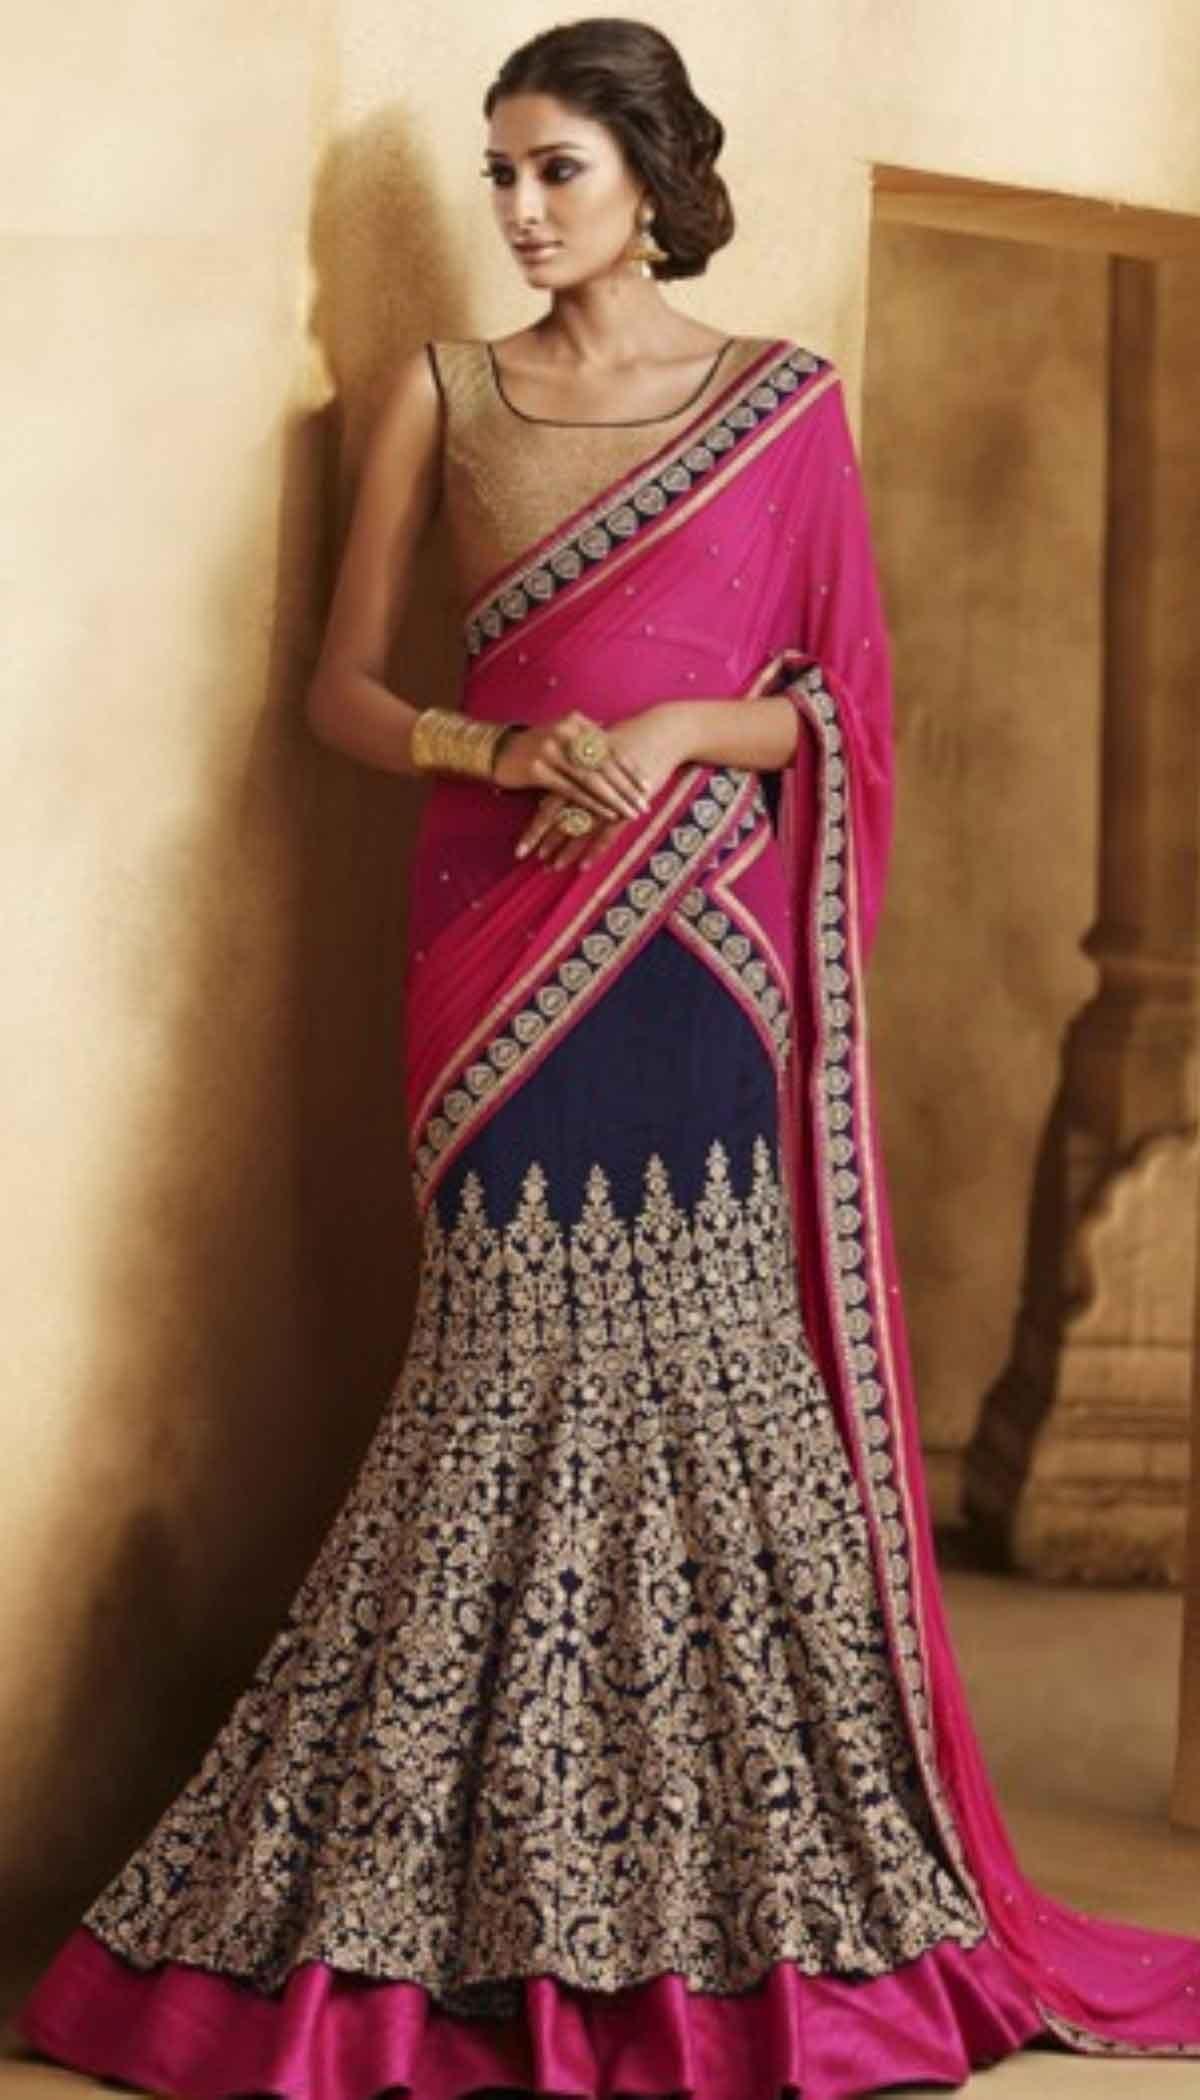 Party Wear Sarees for Elegant Looks - storiestrending.com